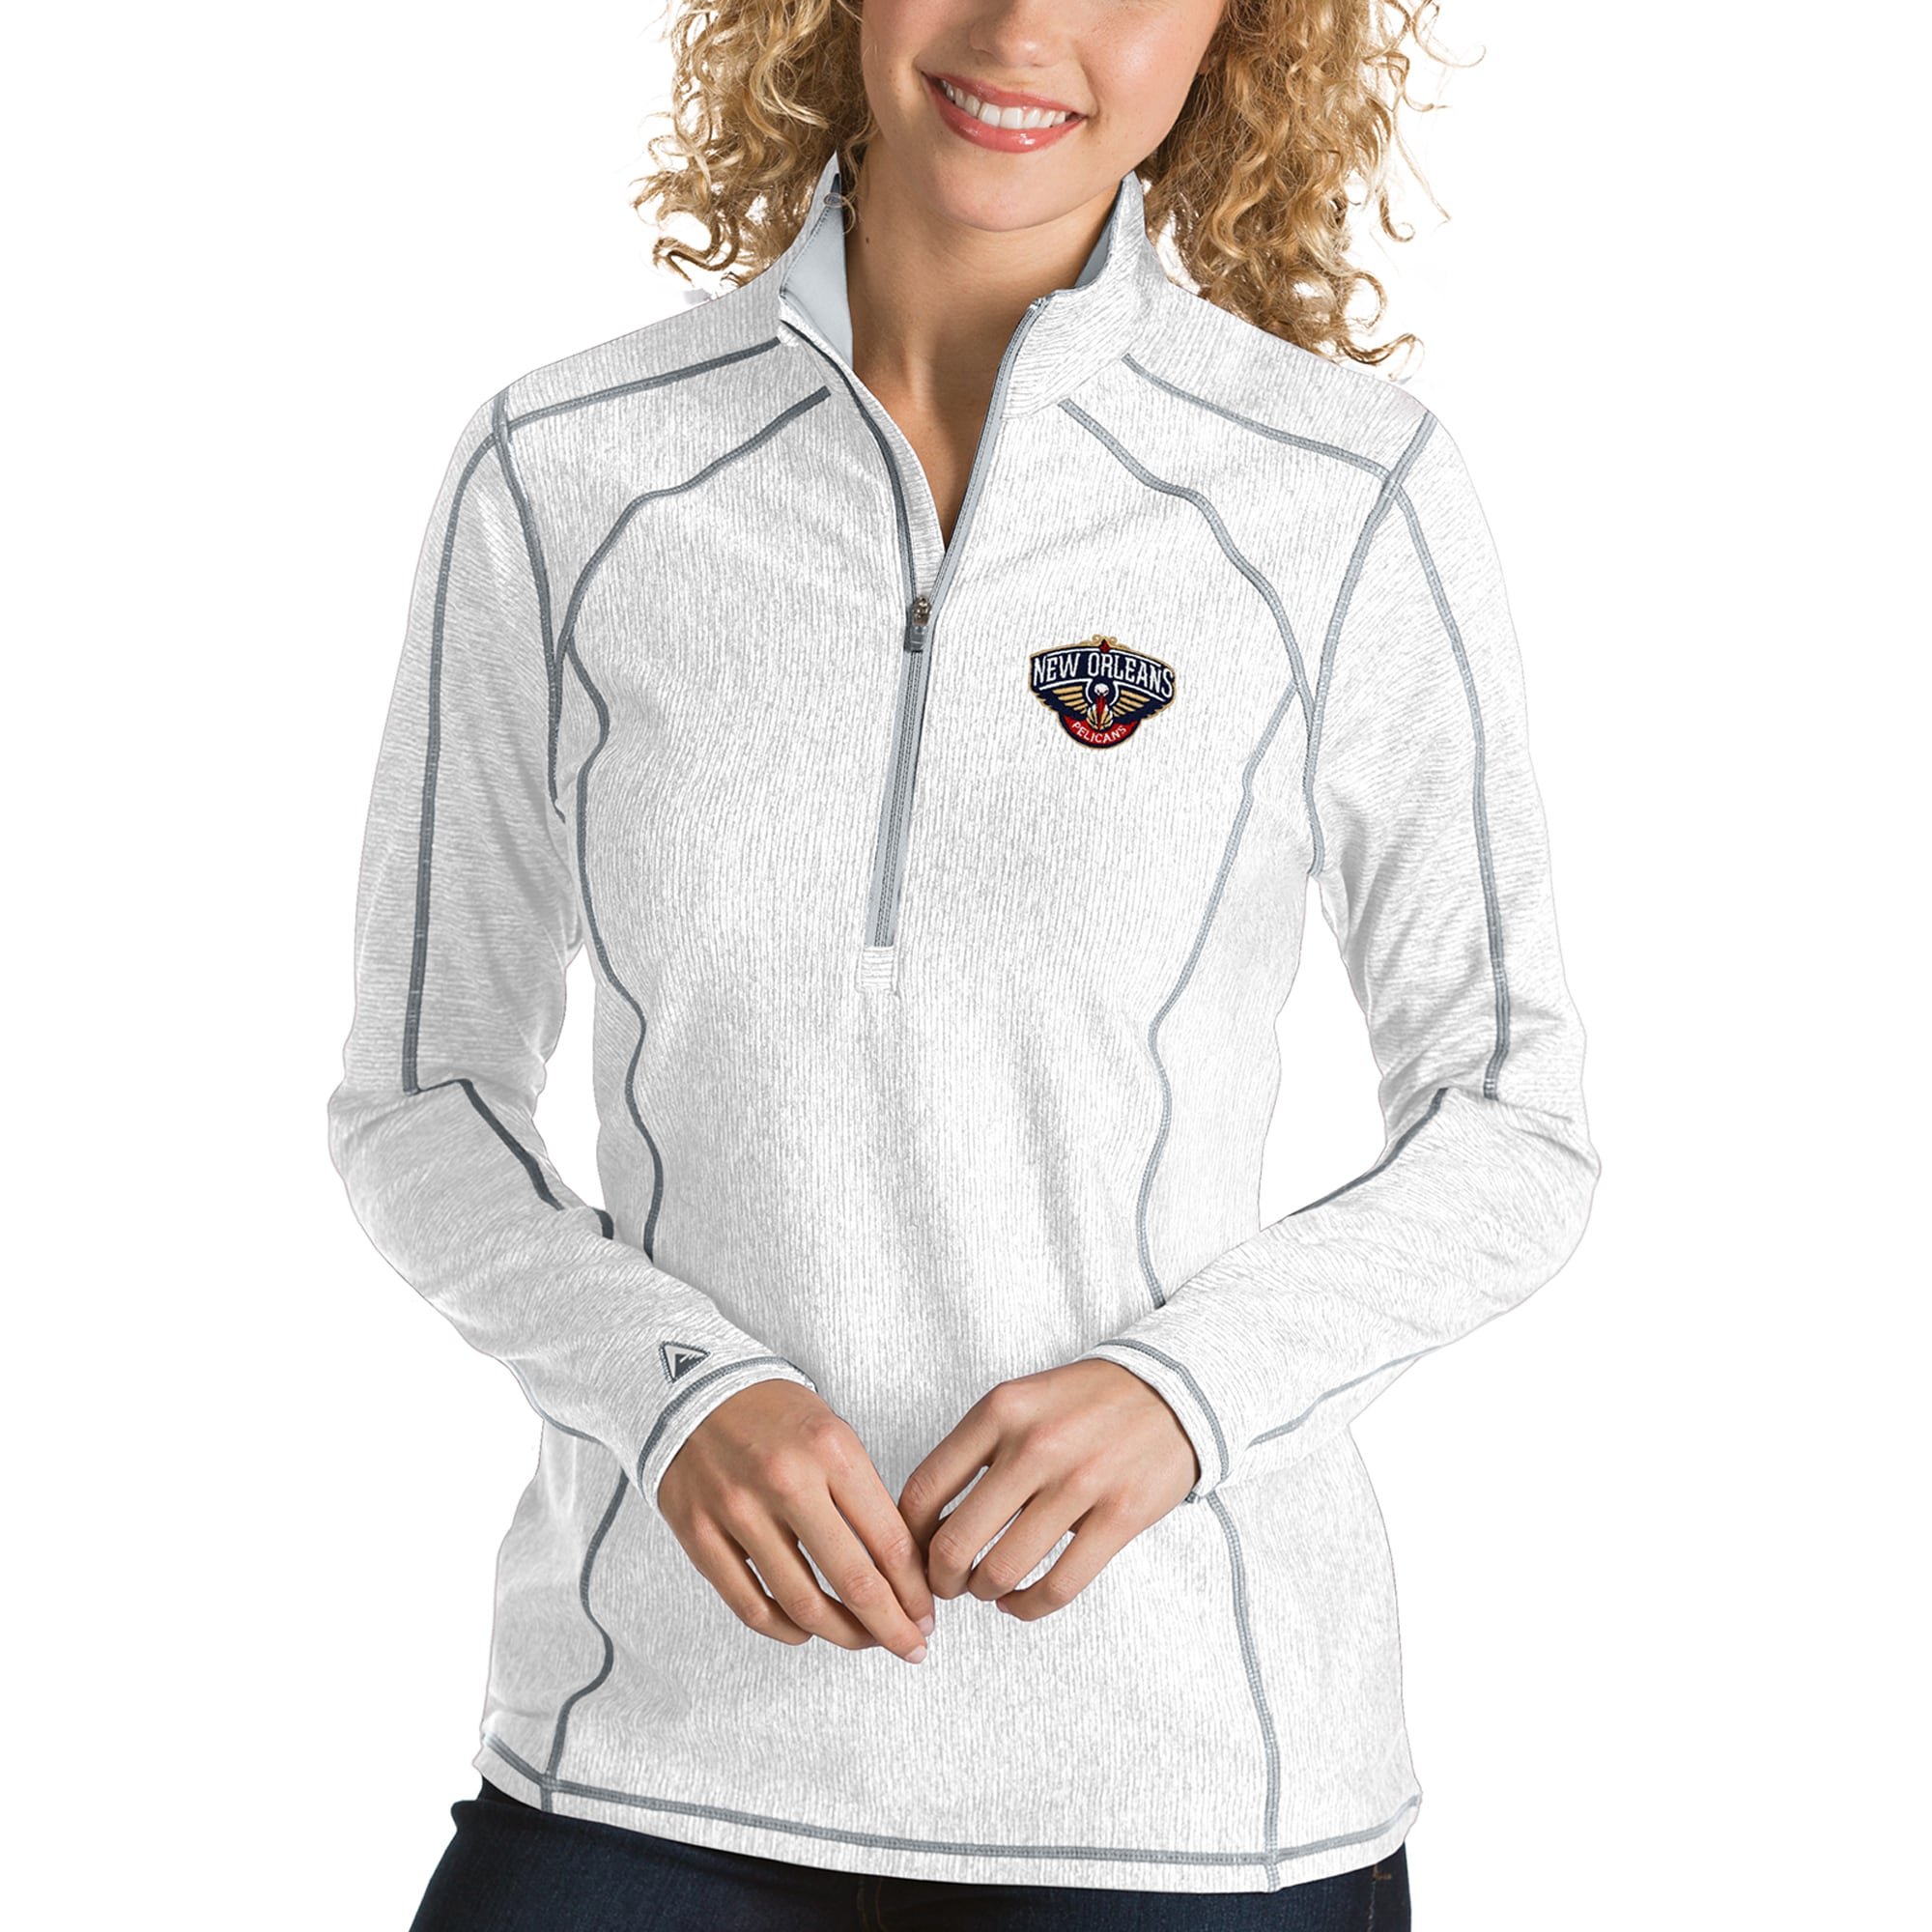 New Orleans Pelicans Antigua Women's Tempo Half-Zip Pullover Jacket - White